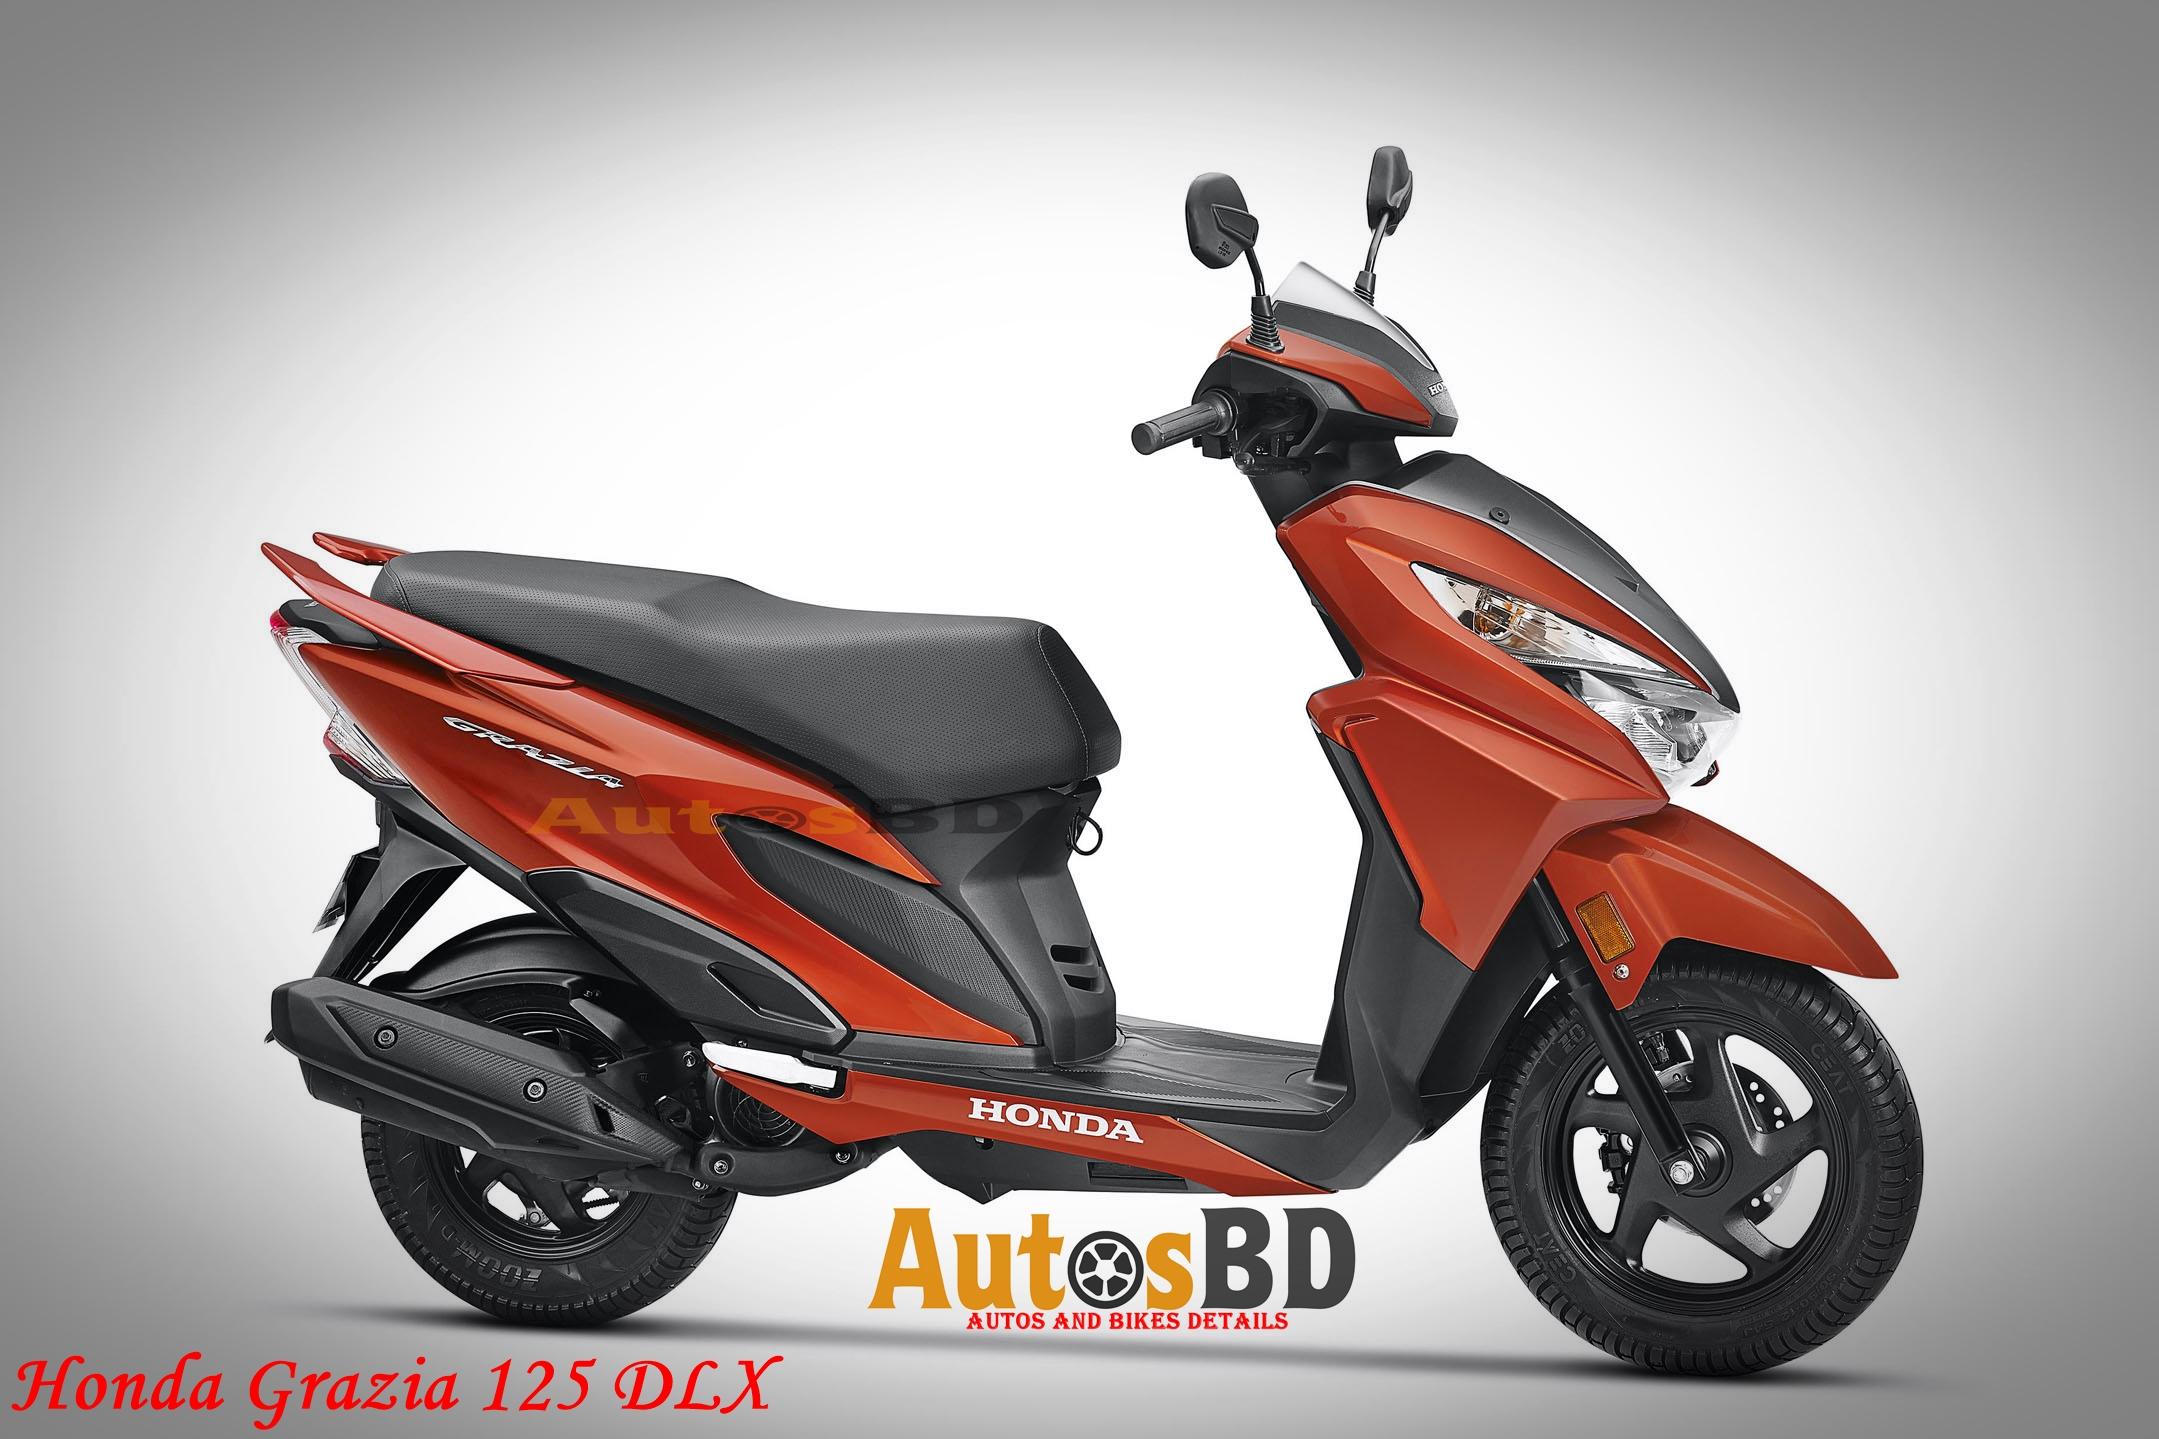 Honda Grazia 125 DLX Motorcycle Price in India